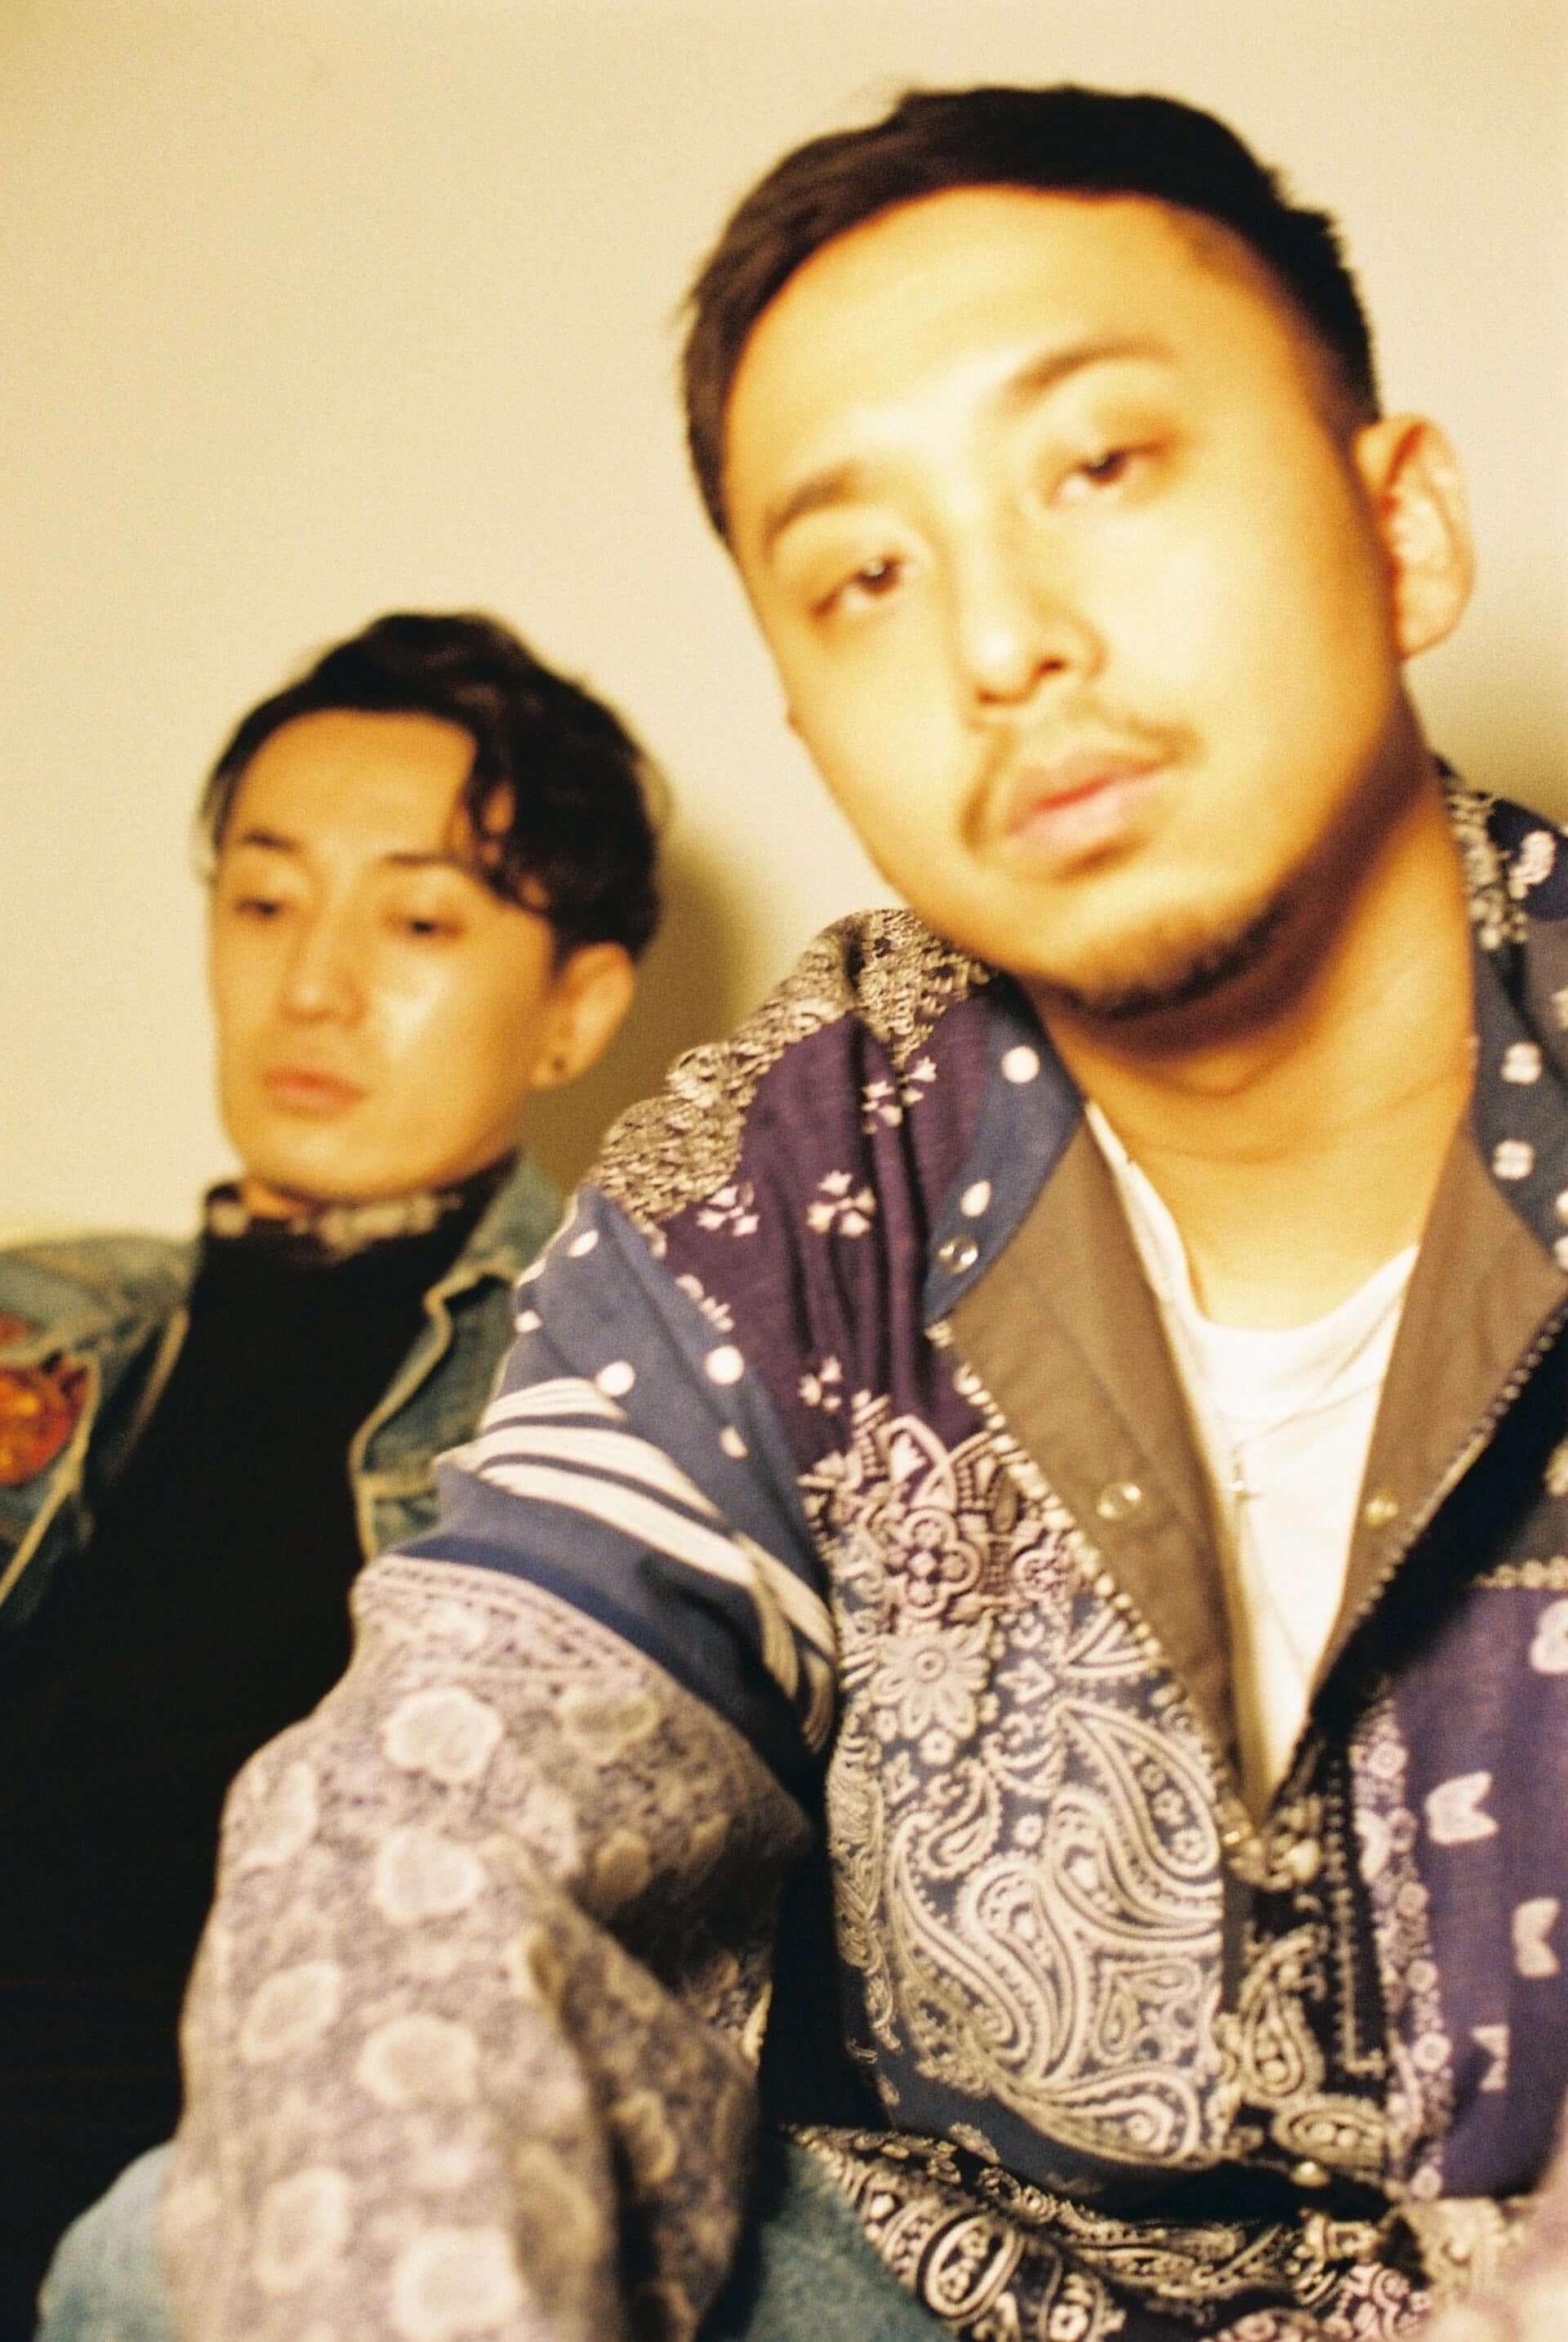 18scottとdownyメンバーのSUNNOVAが、ニューアルバム『PAISLEY』から表題曲のMVを解禁! music200522_18scott_sunnova_01-1920x2868